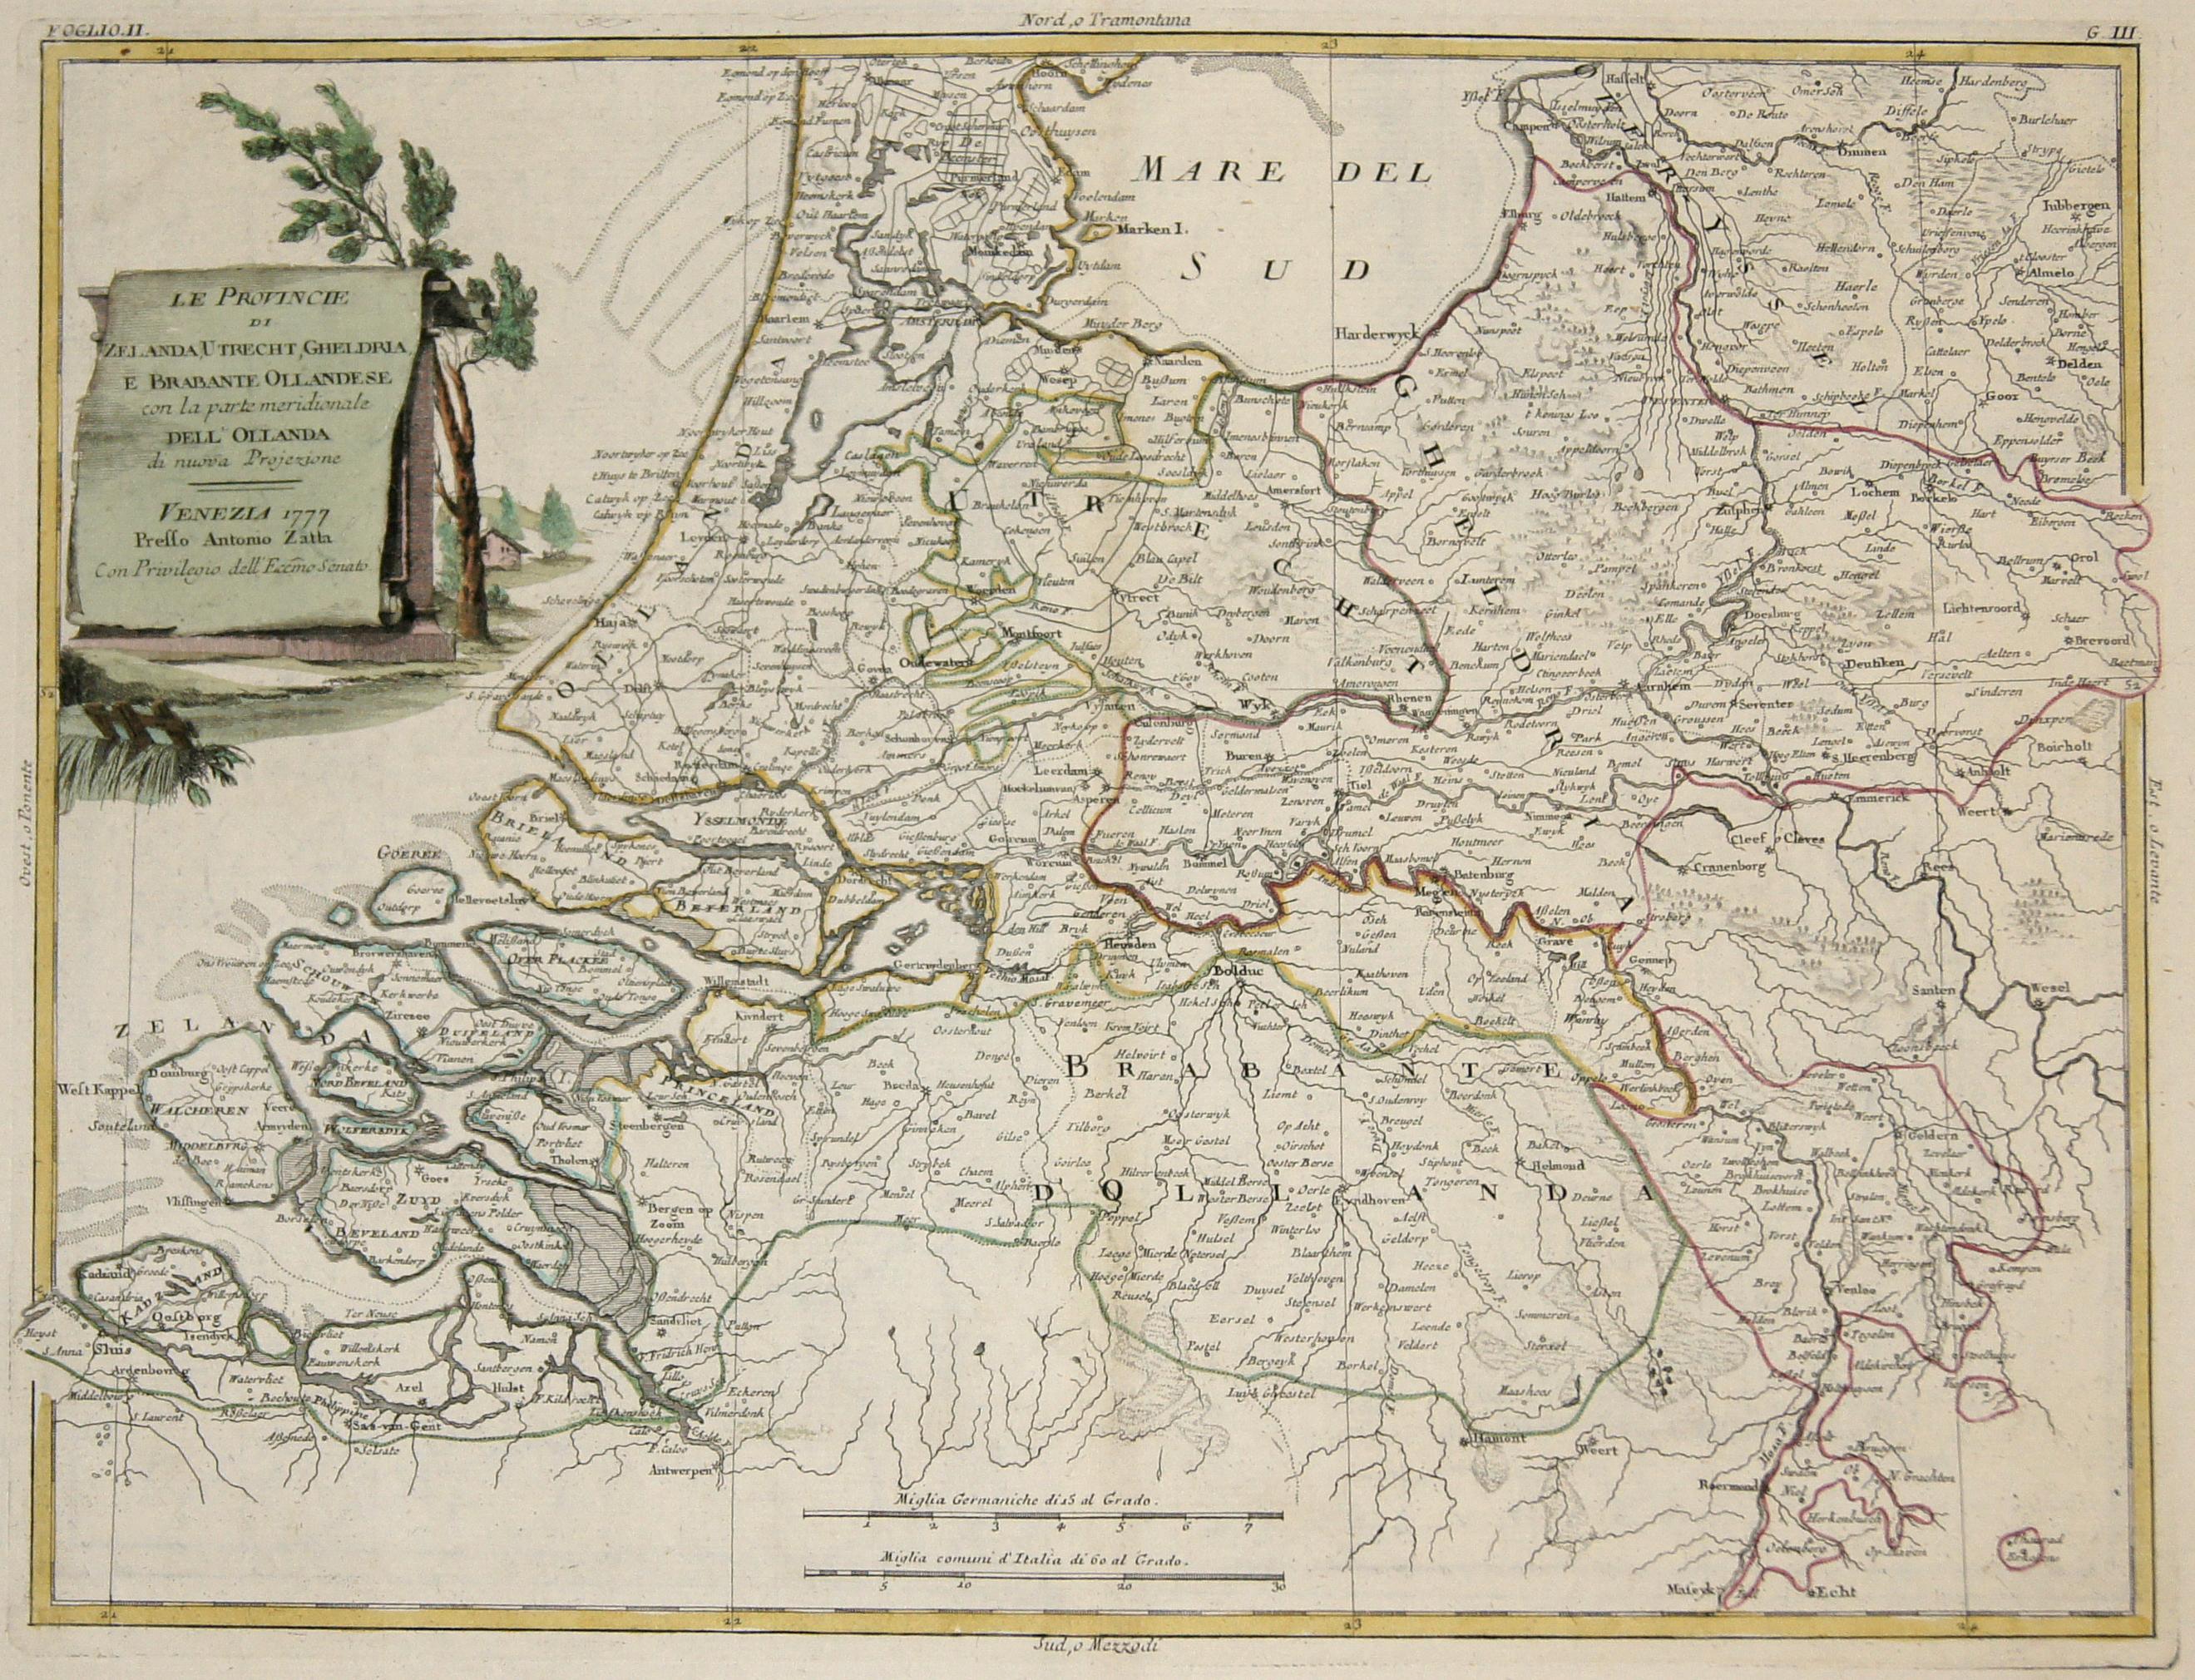 Zatta Antonio Le Provincie di Zelanda, Utrecht, Gheldria, e Brabante Ollandese con la parte meridionale dell' Ollanda